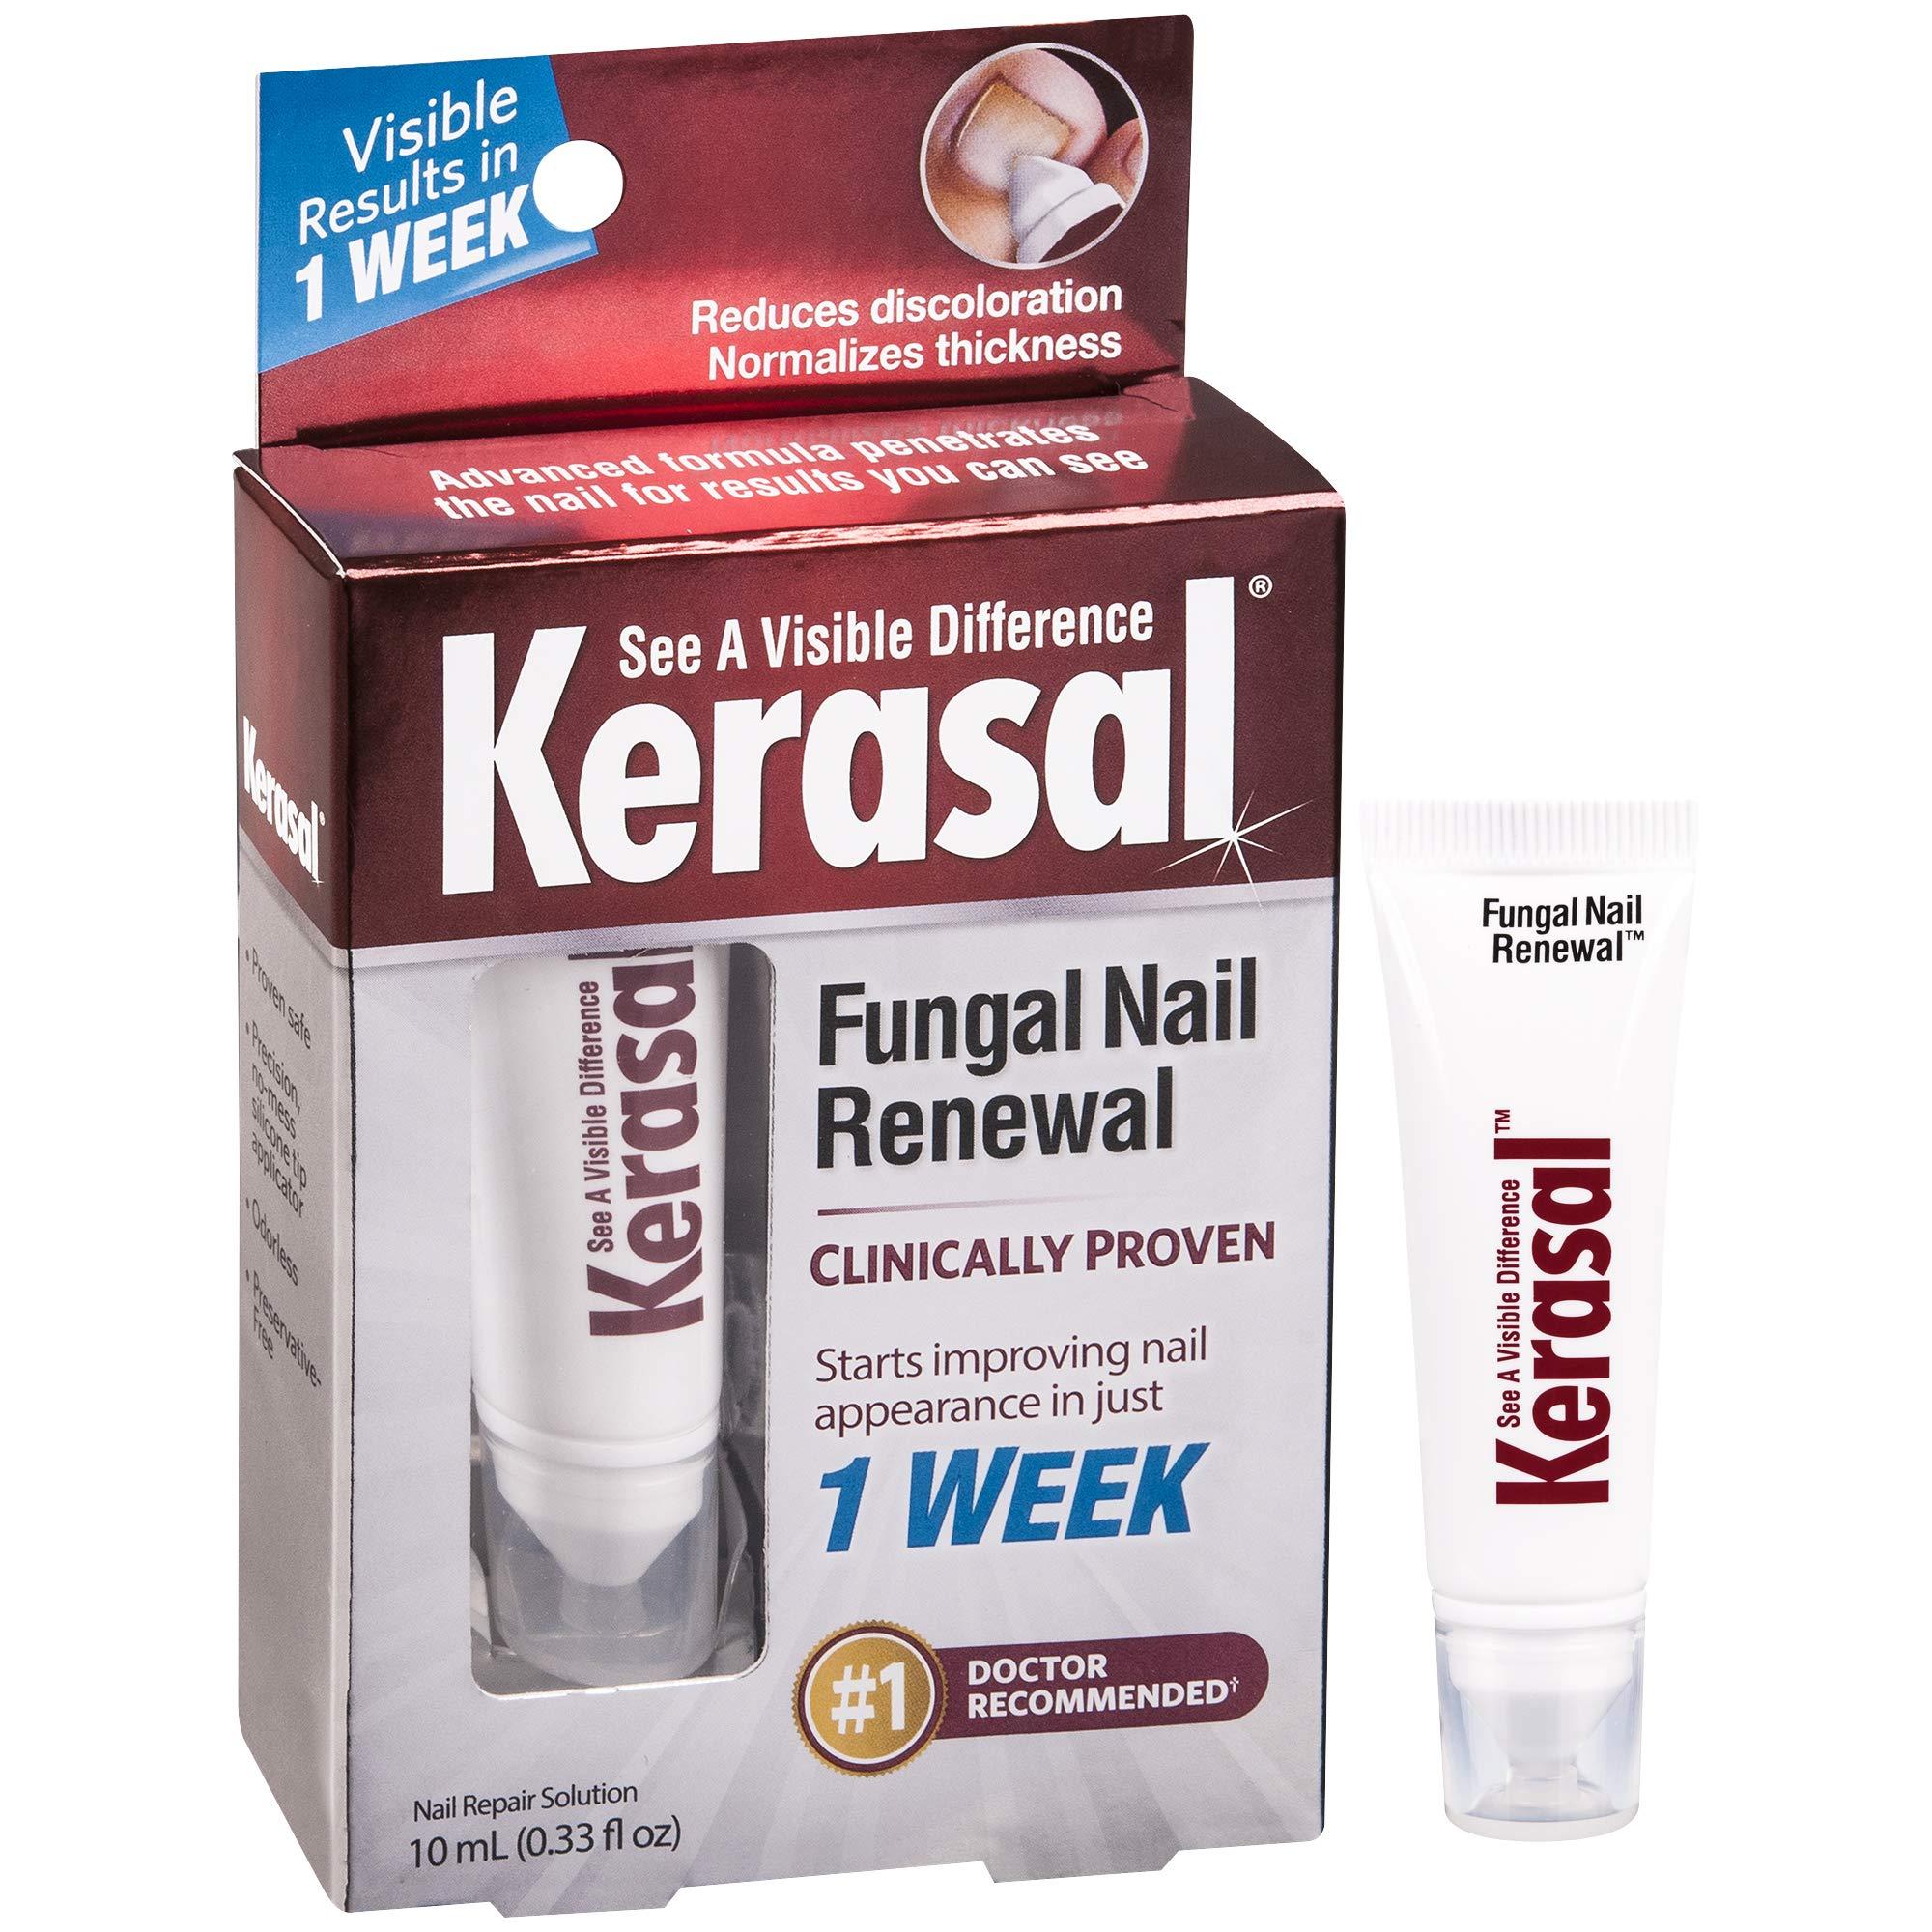 Kerasal Fungal Nail Renewal - Visible results start in just 1 week, 10ml by Kerasal